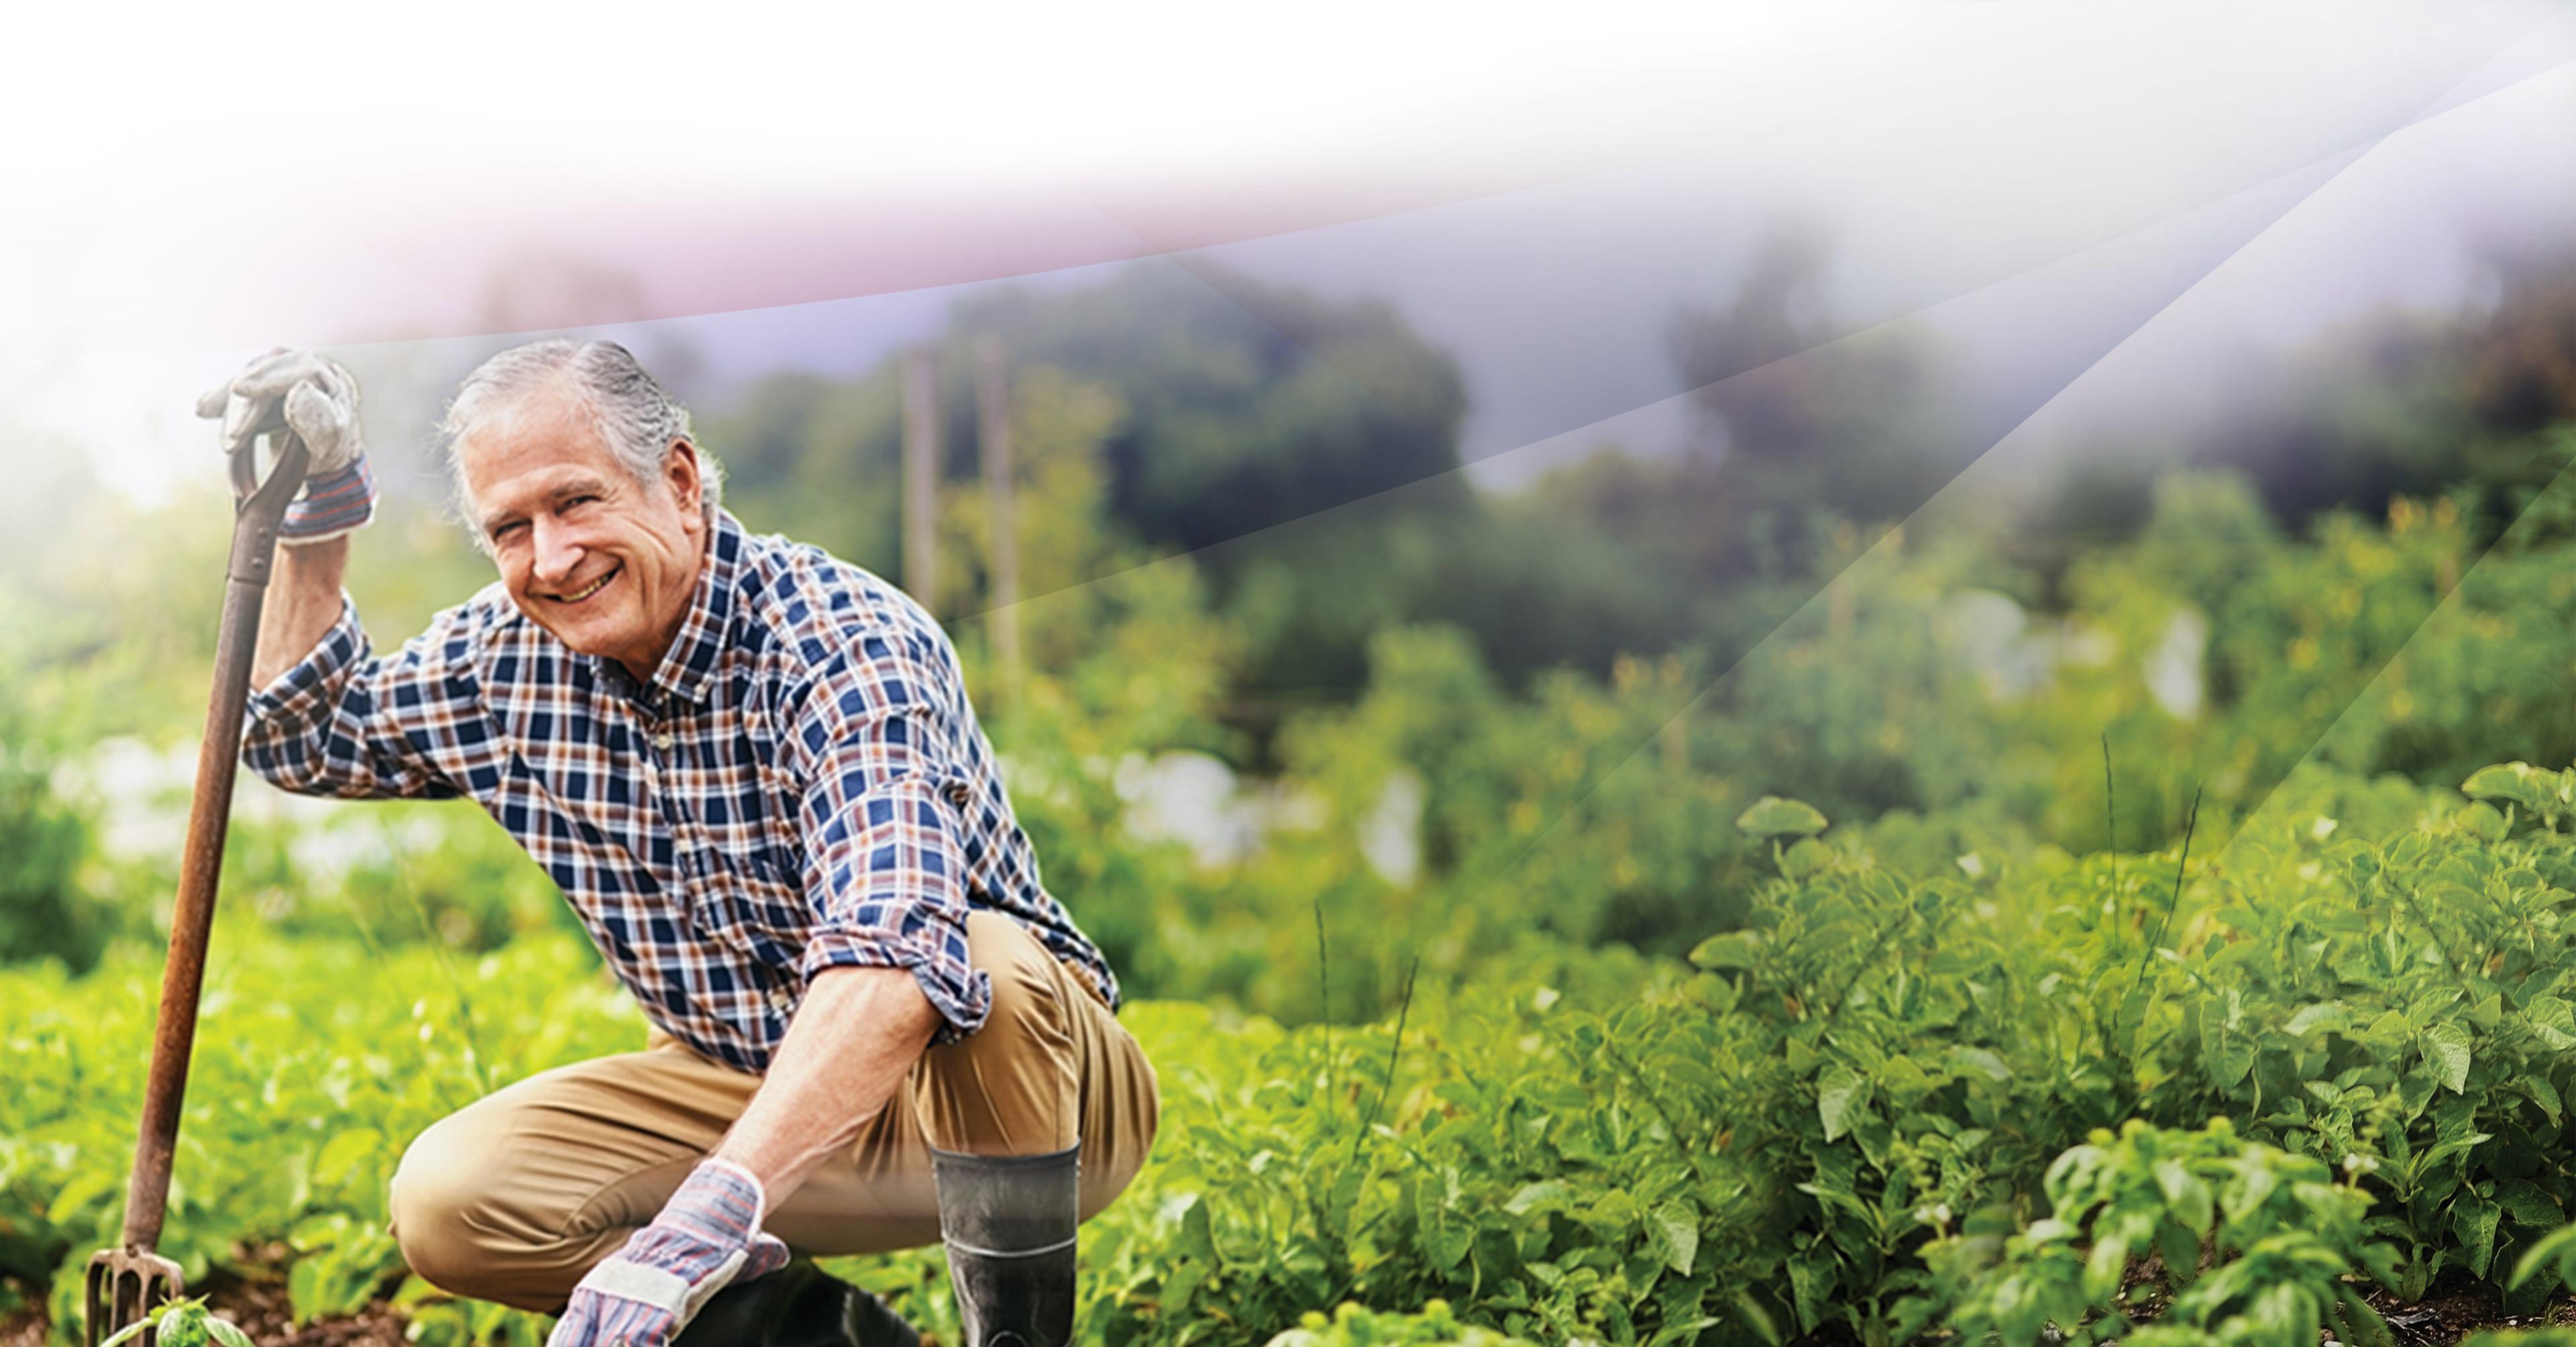 An older man kneeing down to work in his garden